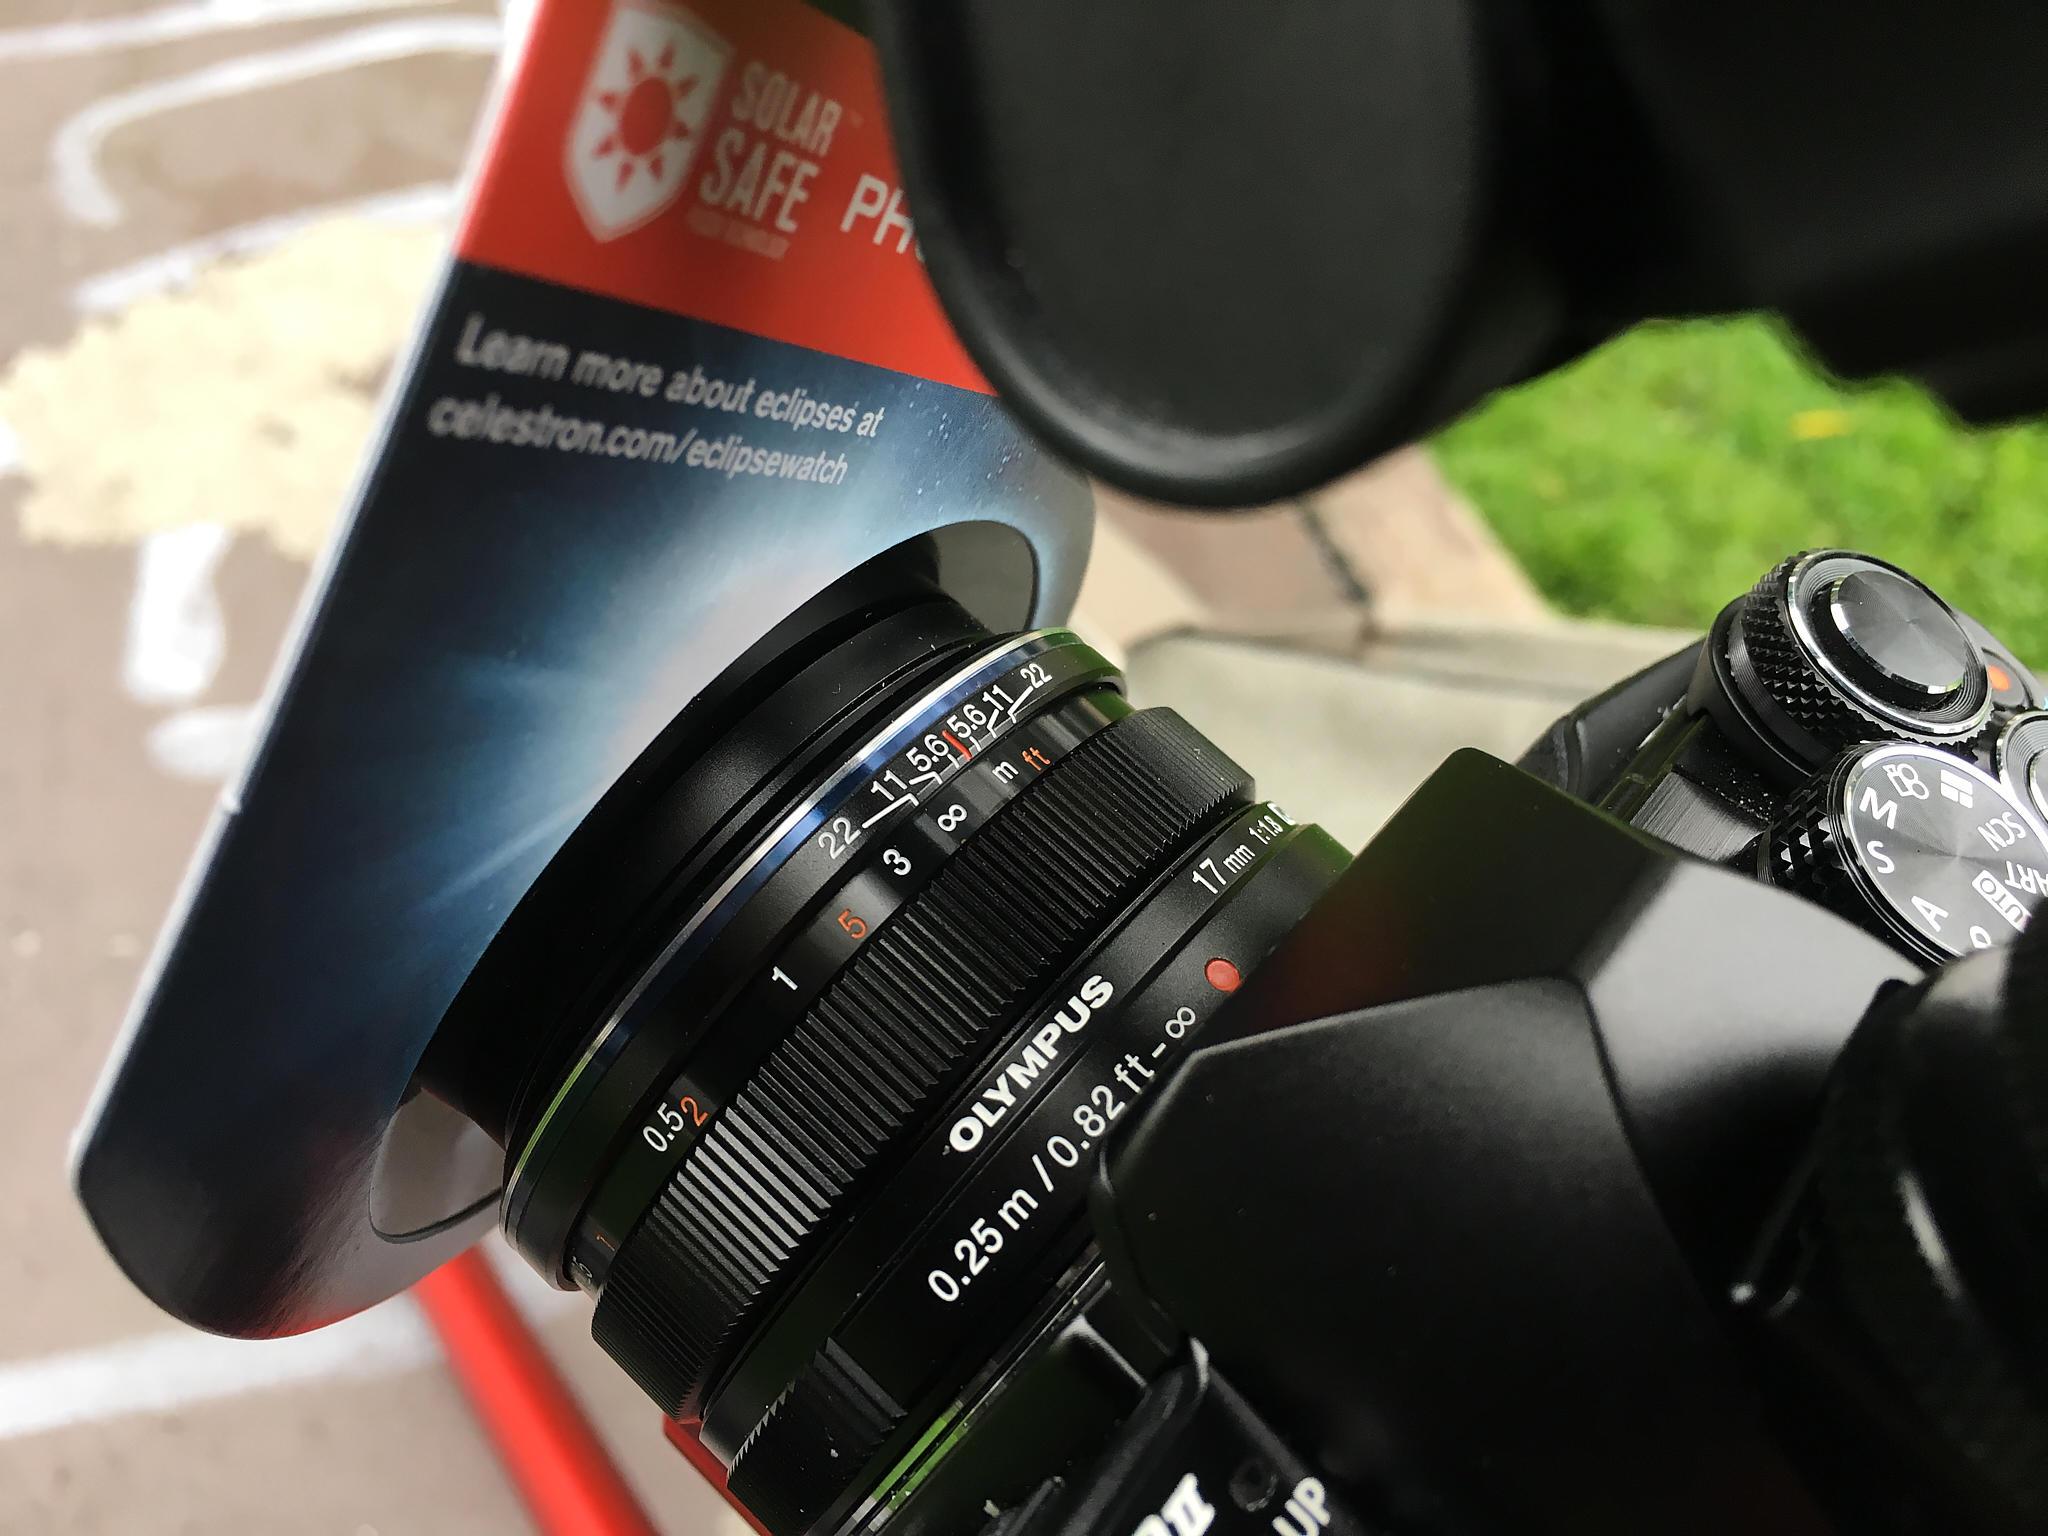 http://thedigitalstory.com/2017/08/22/IMG_4430-Solar-Eclipse.jpg